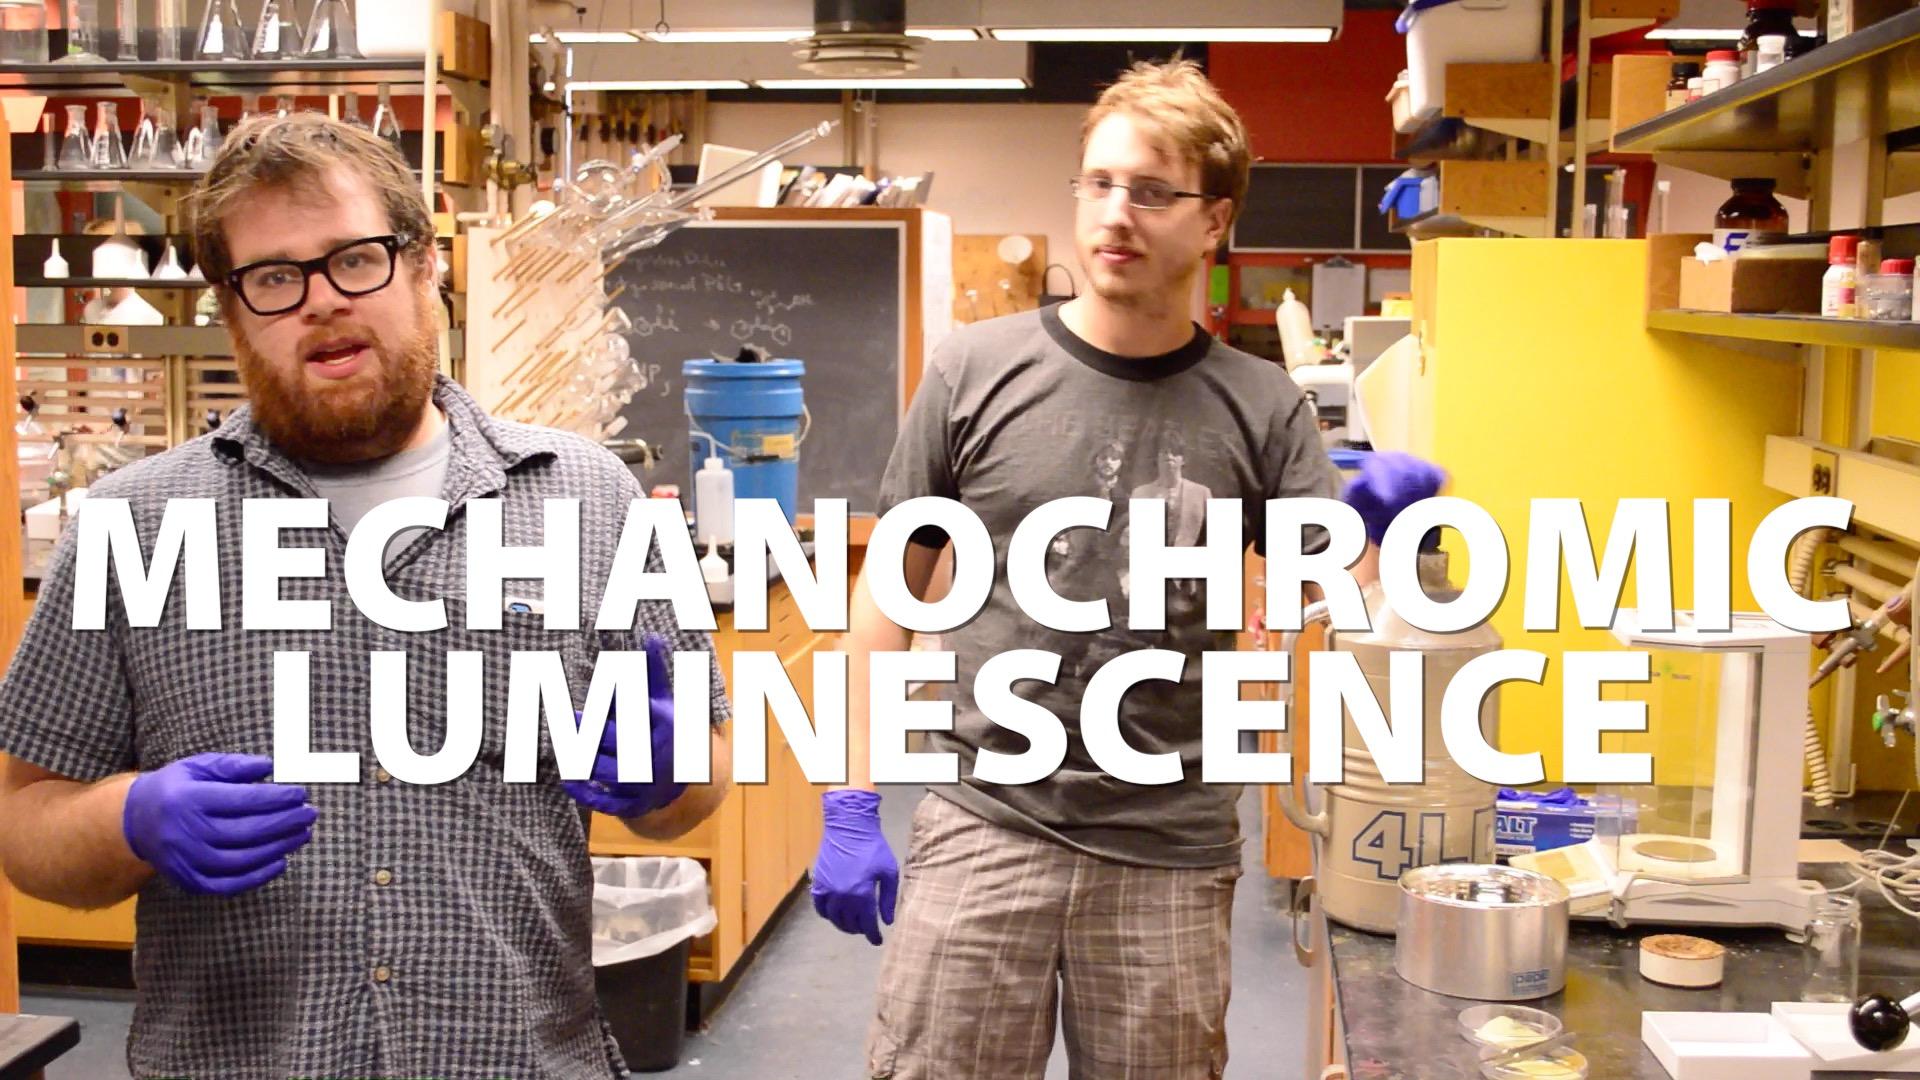 Mechanochromic Luminescence